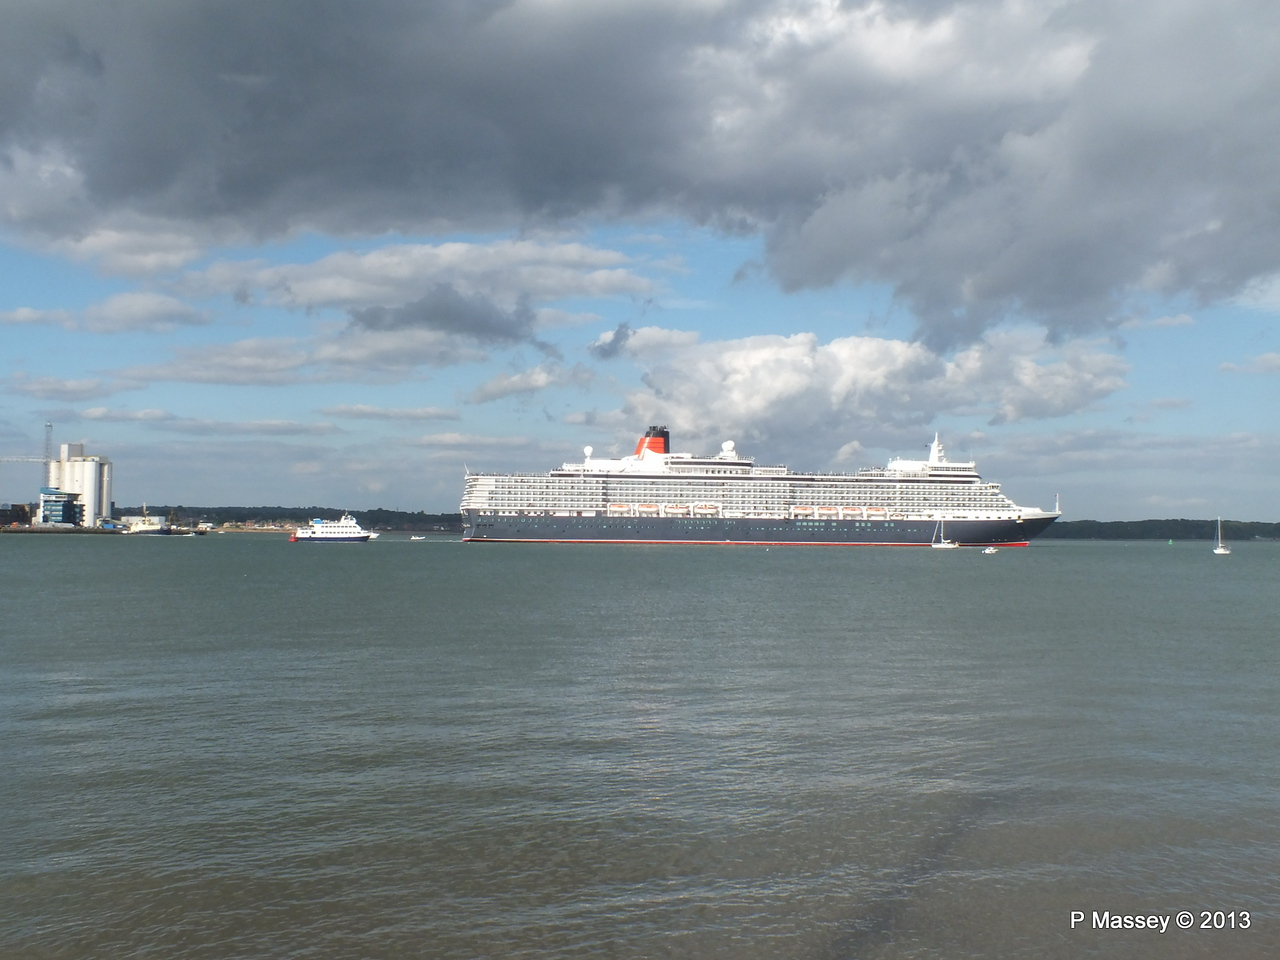 QUEEN ELIZABETH Departing Southampton OCEAN SCENE PDM 10-08-2013 17-53-59